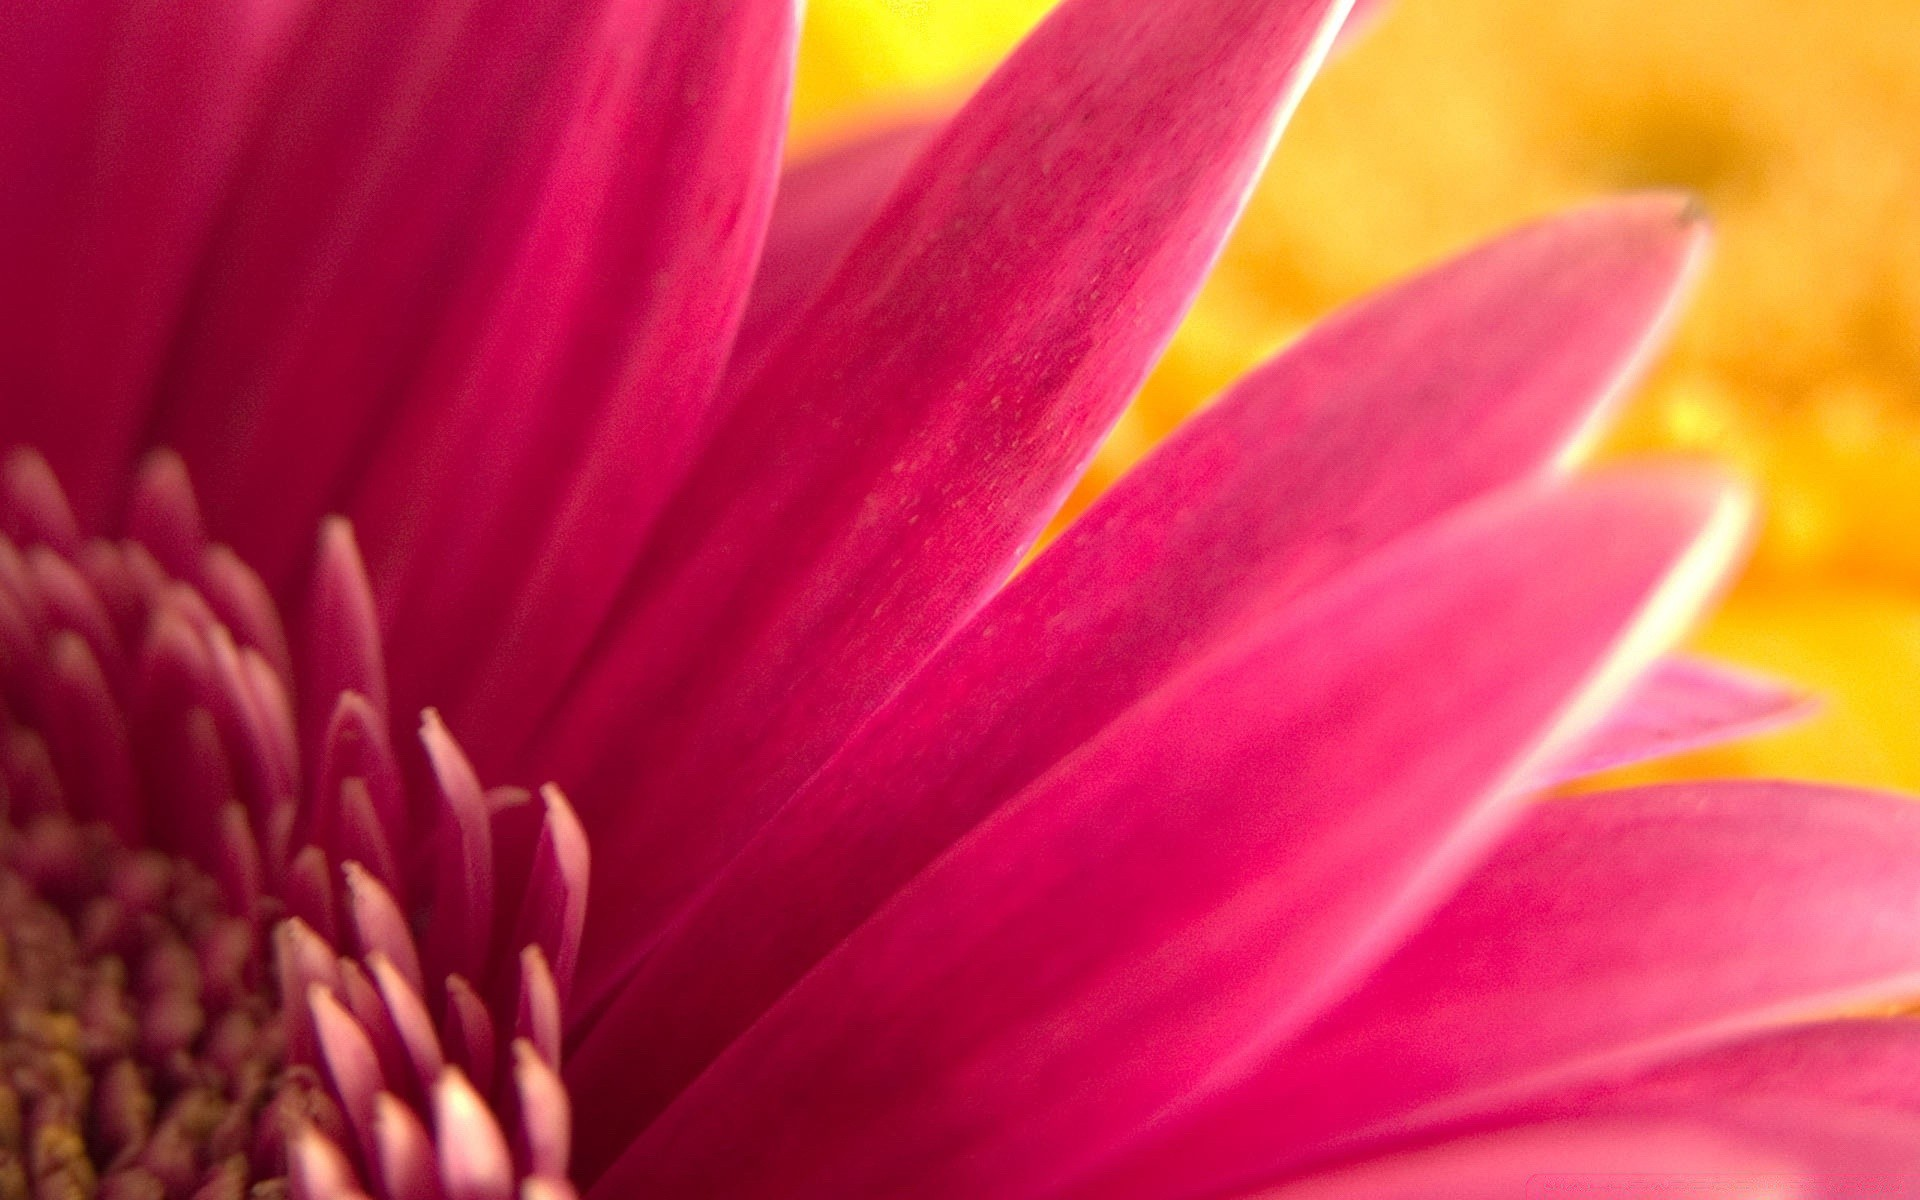 dark pink flowers - HD1920×1200